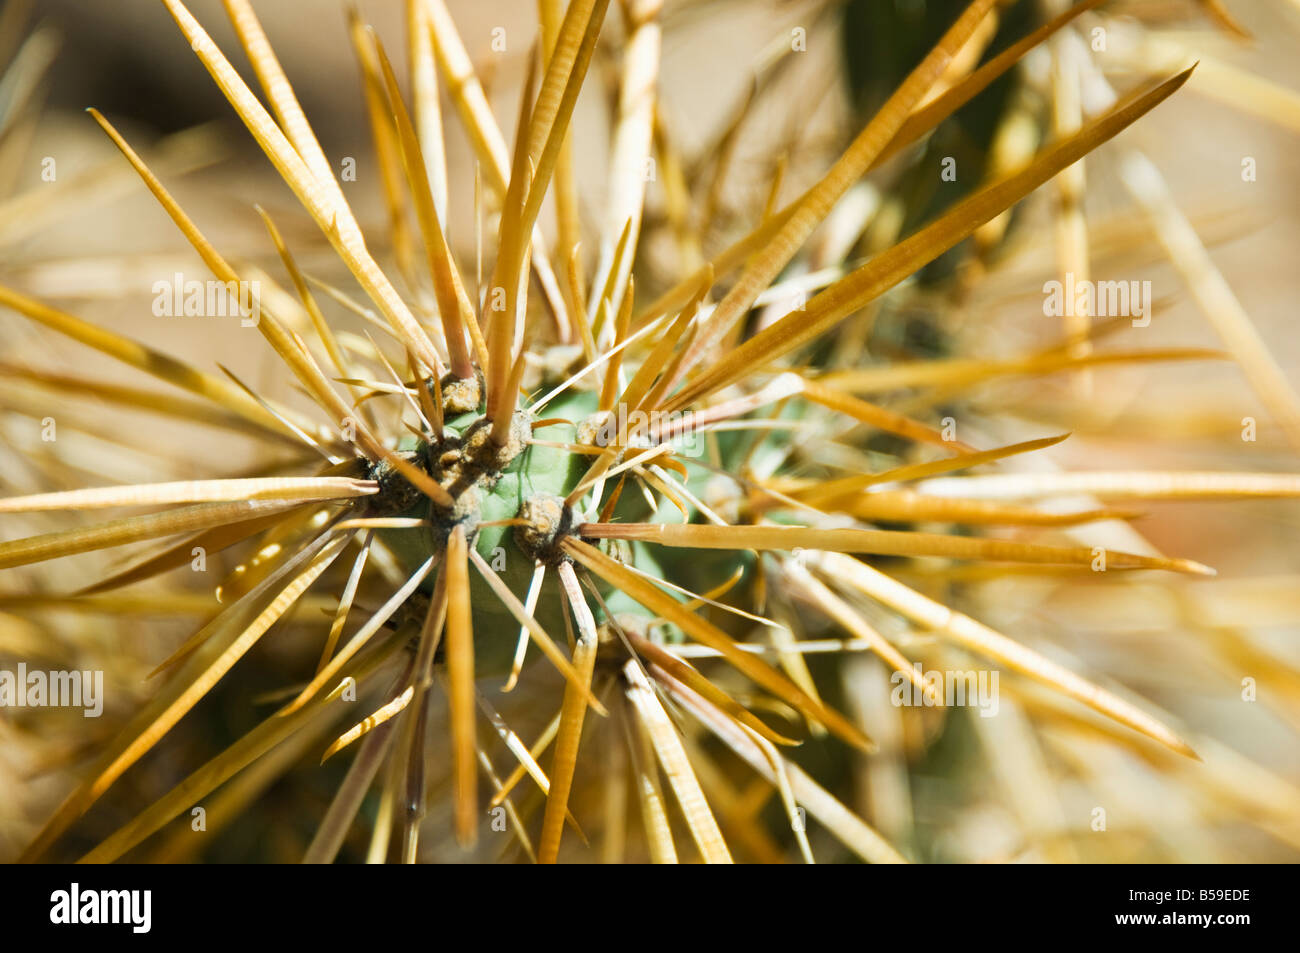 close up of cactus - Stock Image